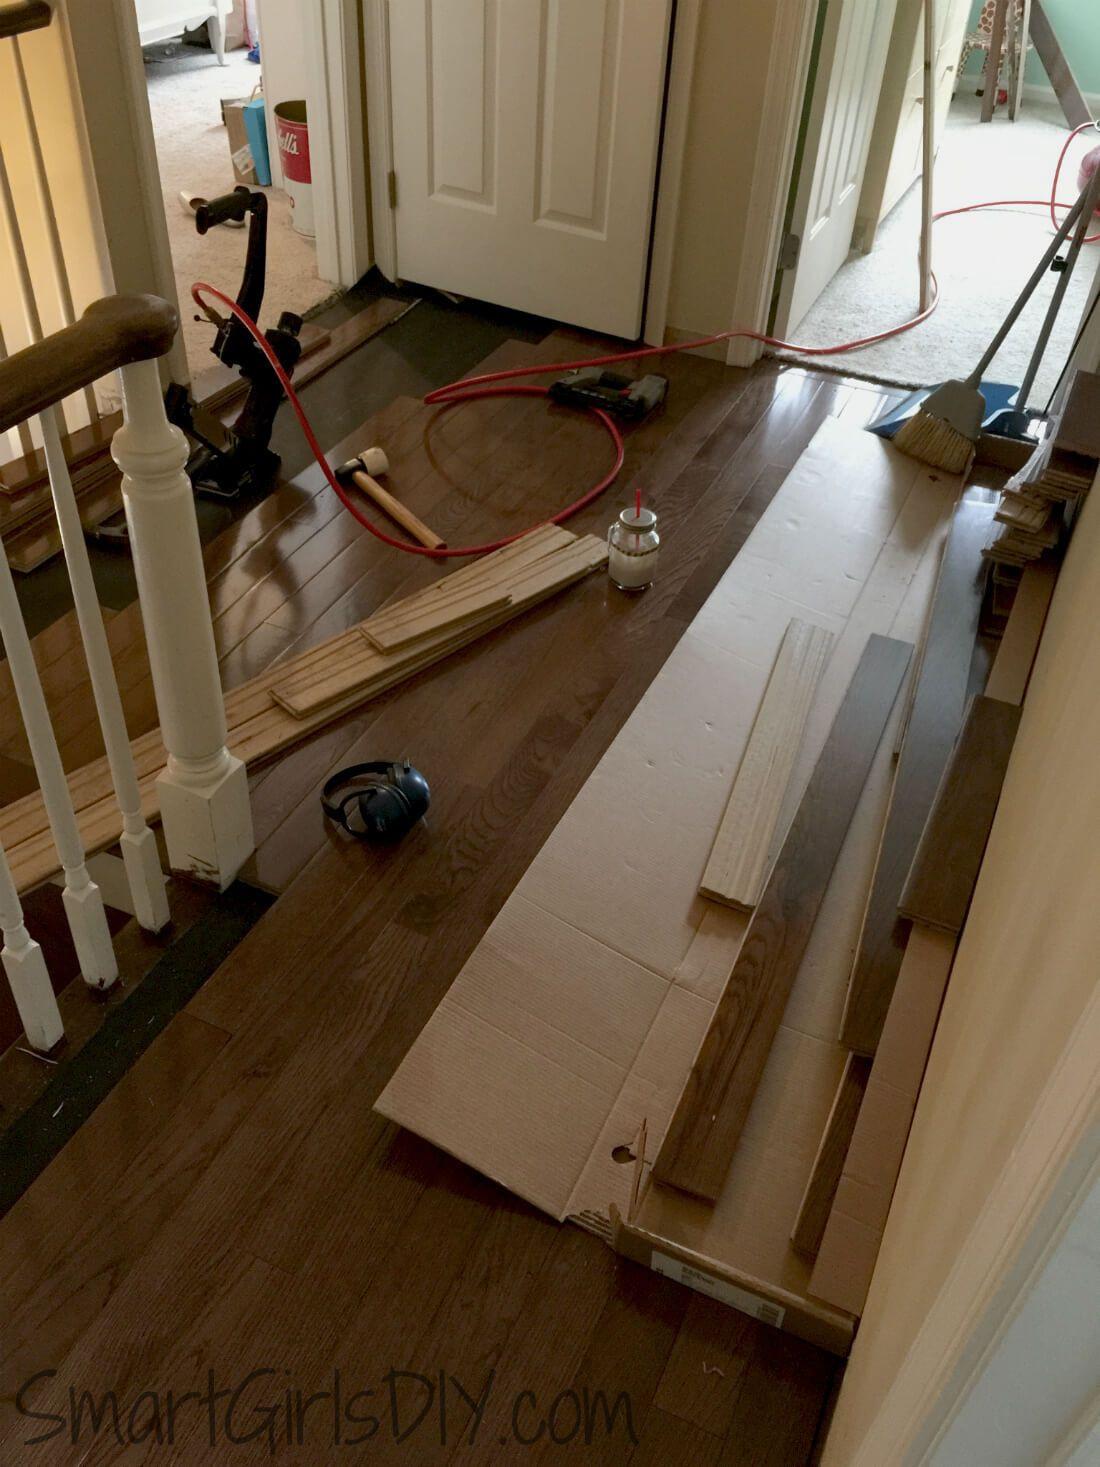 What tools are Needed to Install Hardwood Flooring Of Upstairs Hallway 1 Installing Hardwood Floors Inside How to Install Hardwood Floor All by Yourself